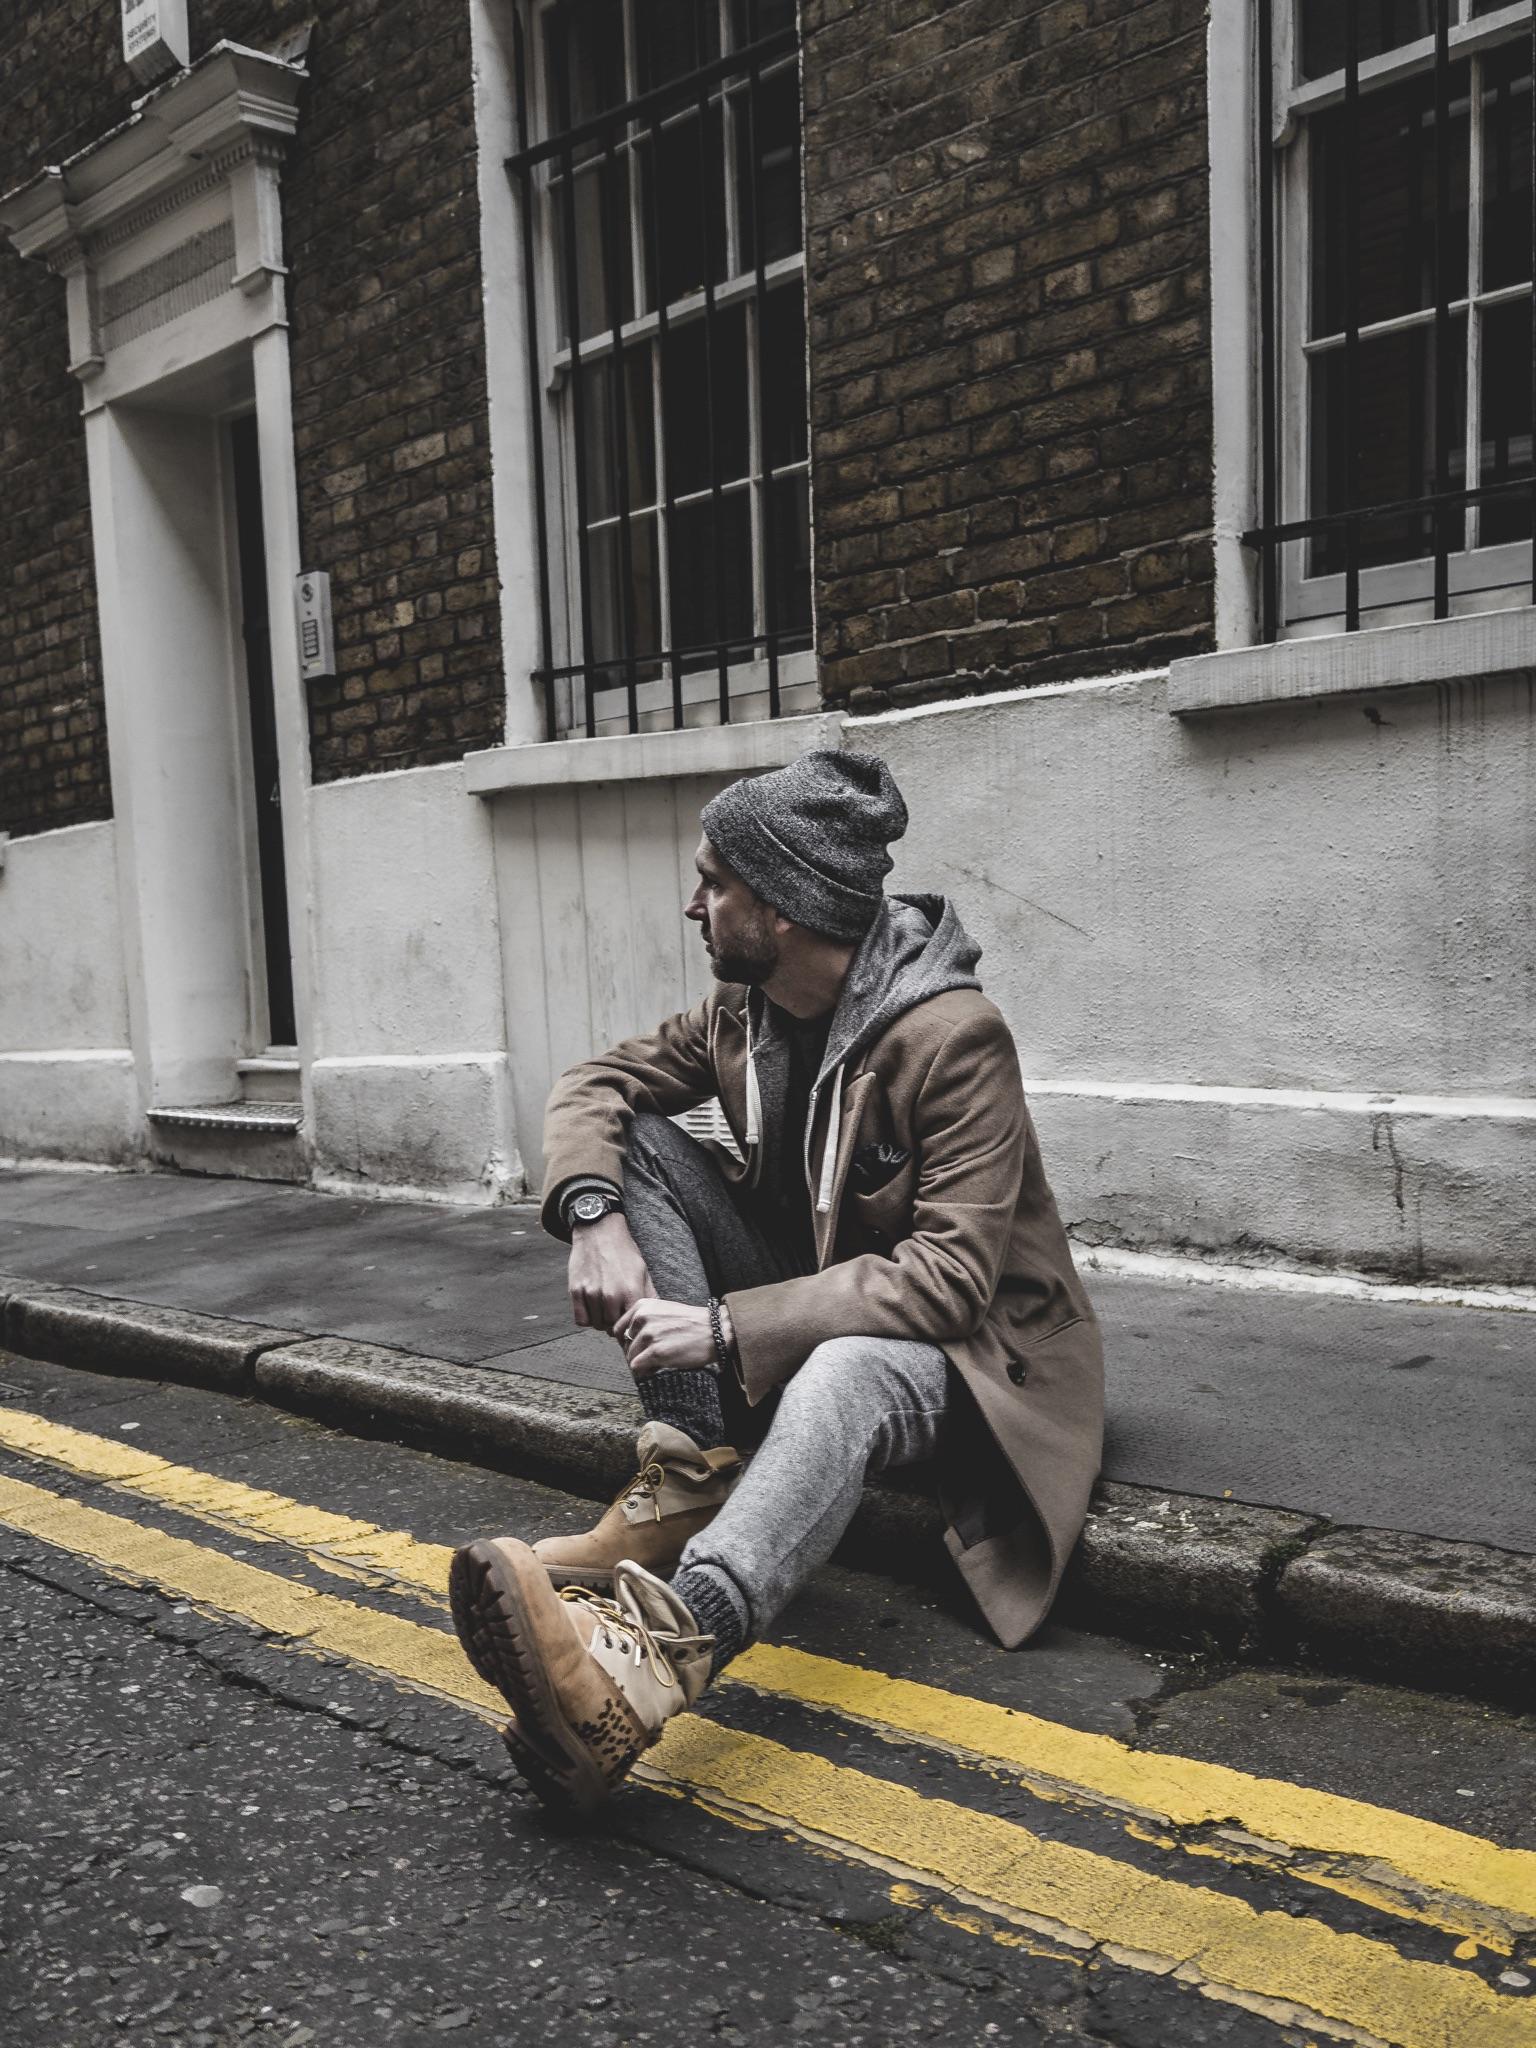 Jay McLaughlin OOTD OOTDMen Style Outfit Timberlands Camel Coat Beanie Joggers Sweatpants Menswear Street London Timex Marks & Spencer Beanie Stylonylon